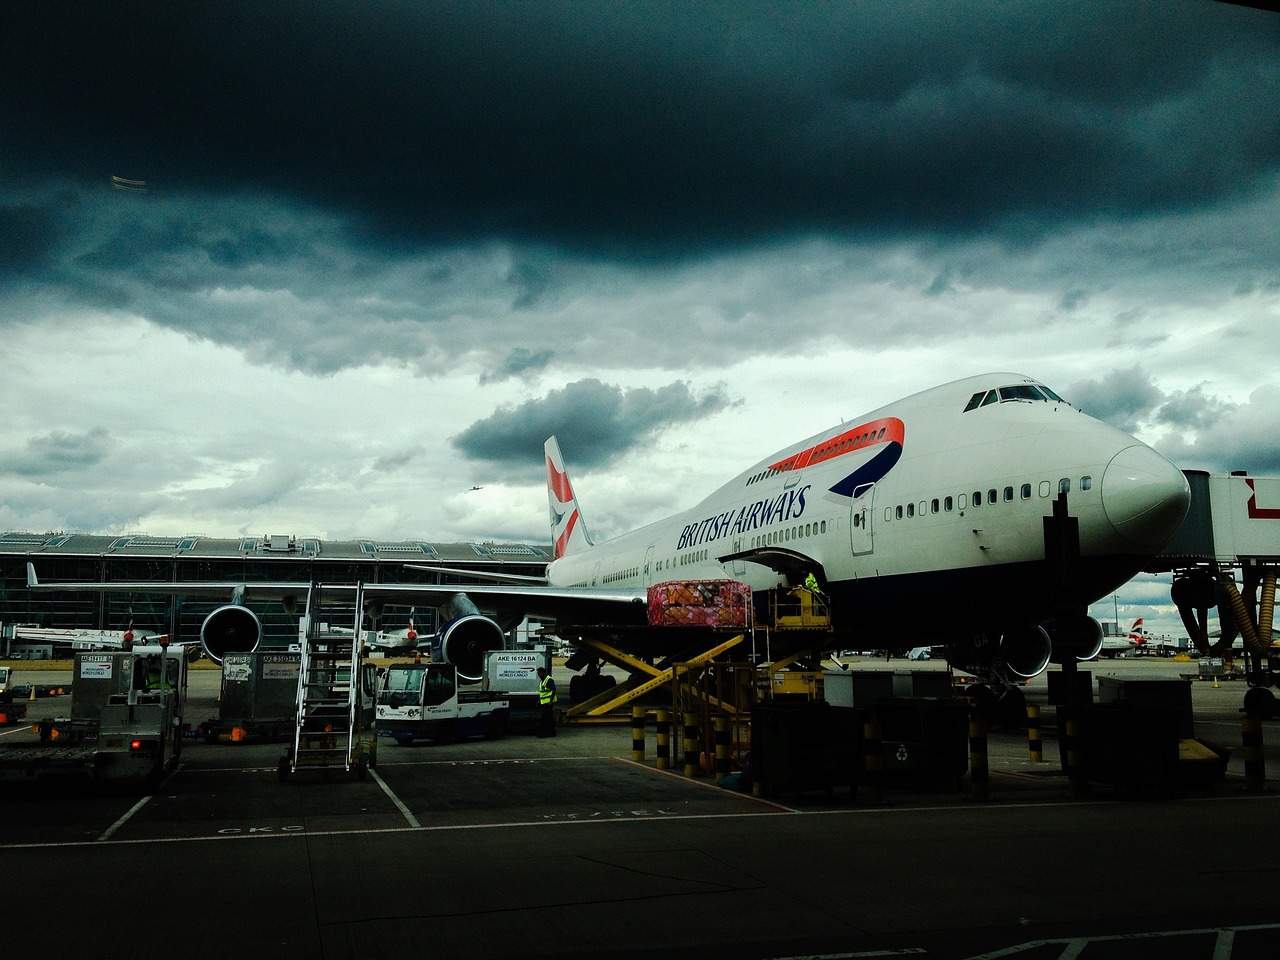 airplane-british airwas-airport